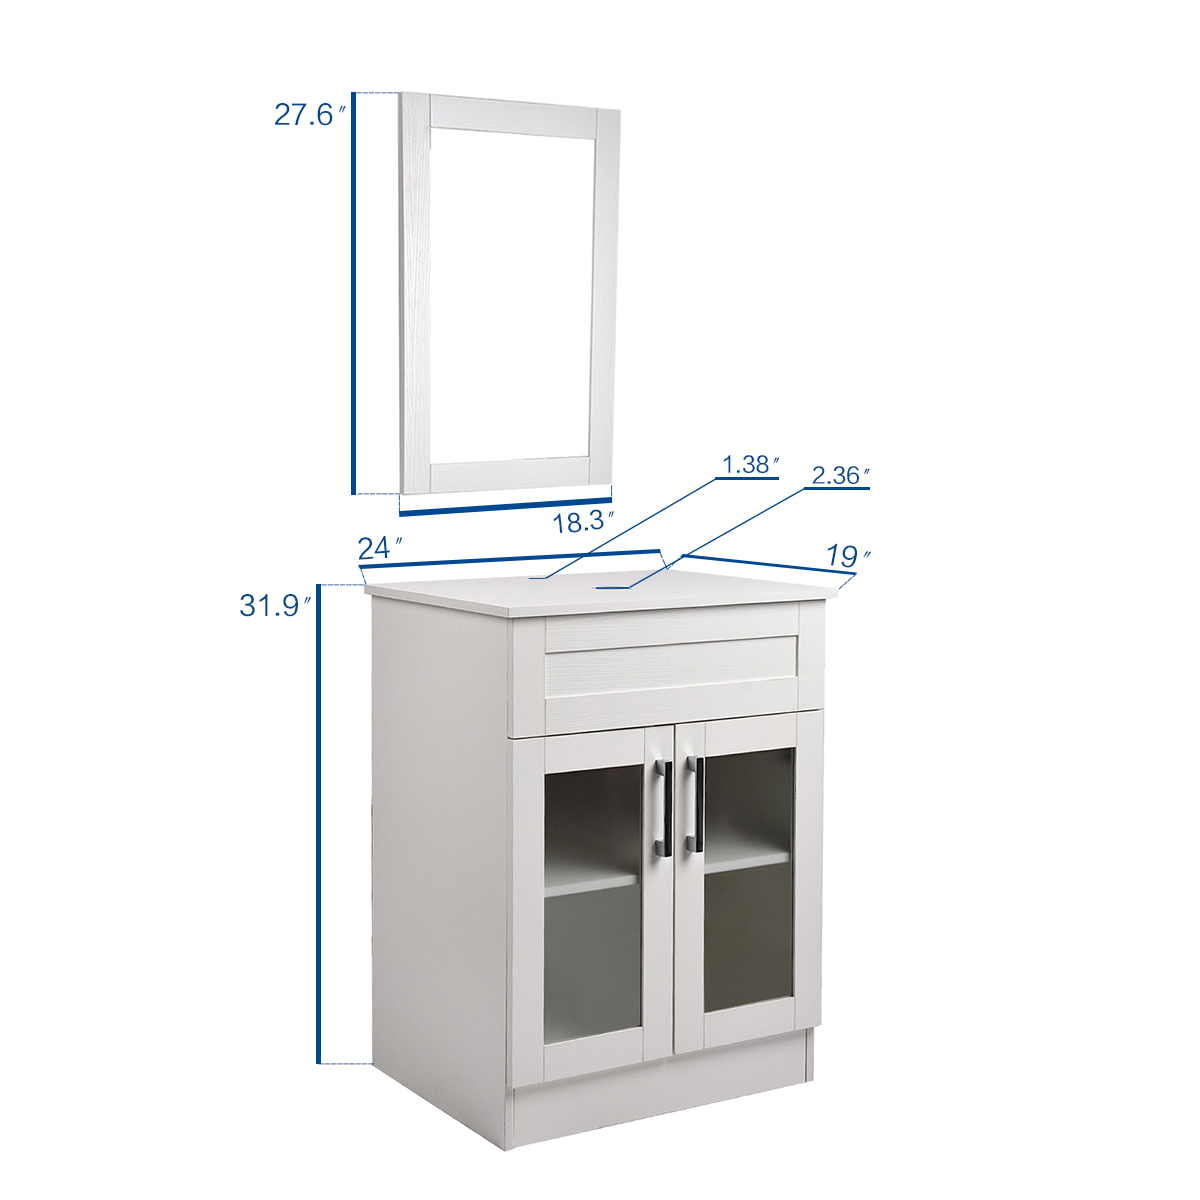 Details About 24 Inch Bathroom Vanity Set Wood Cabinet Vessel Gl Sink Faucet Mirror Combo